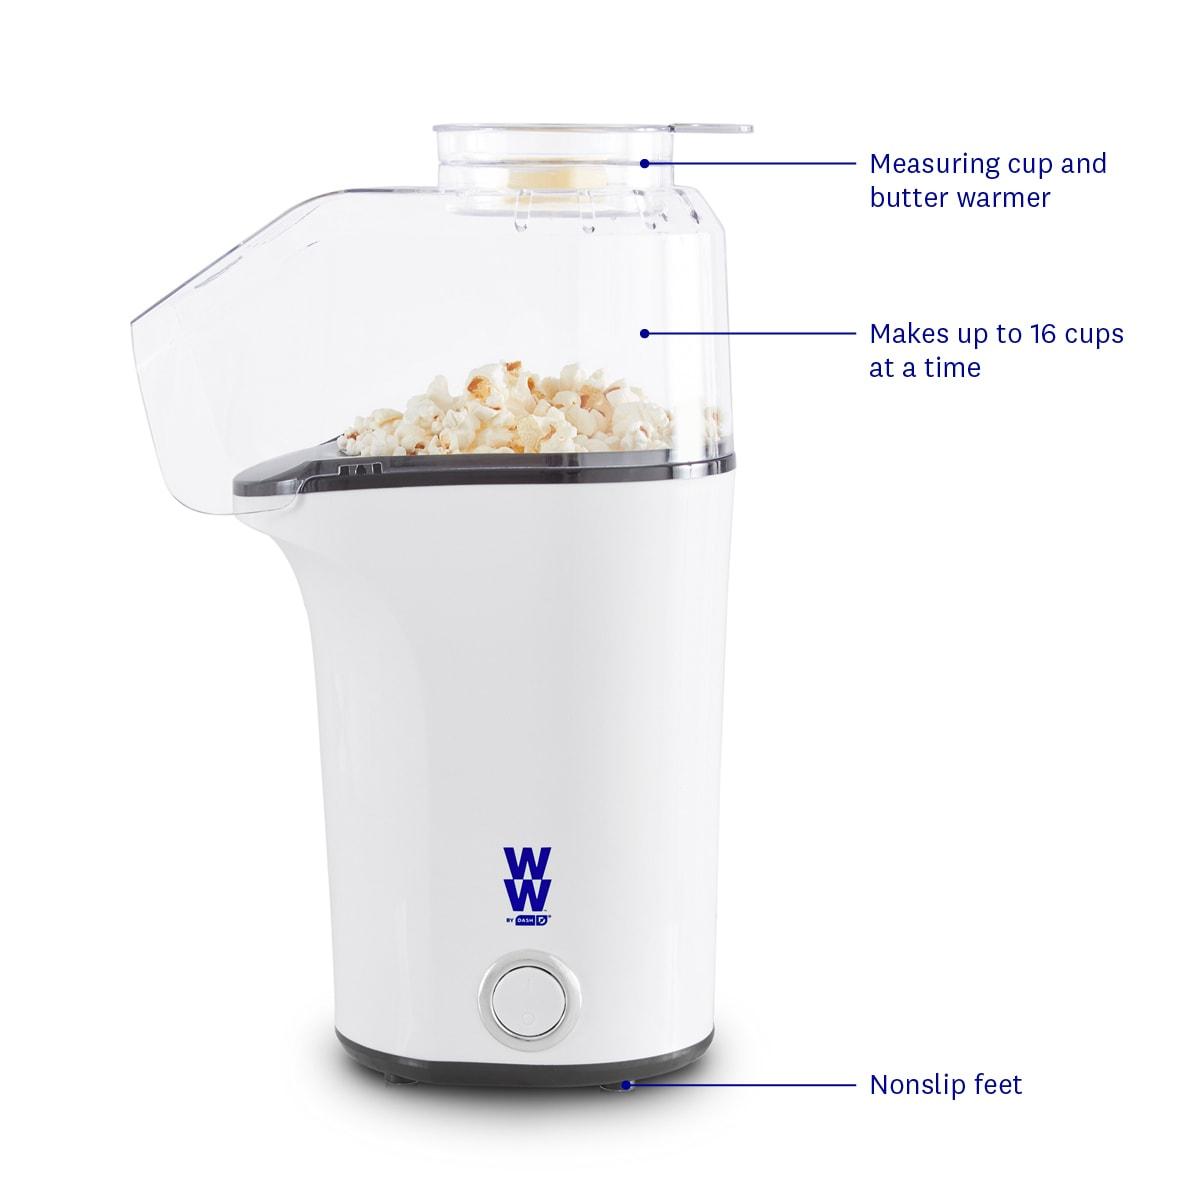 WW by Dash Fresh Pop Popcorn Maker - side callouts